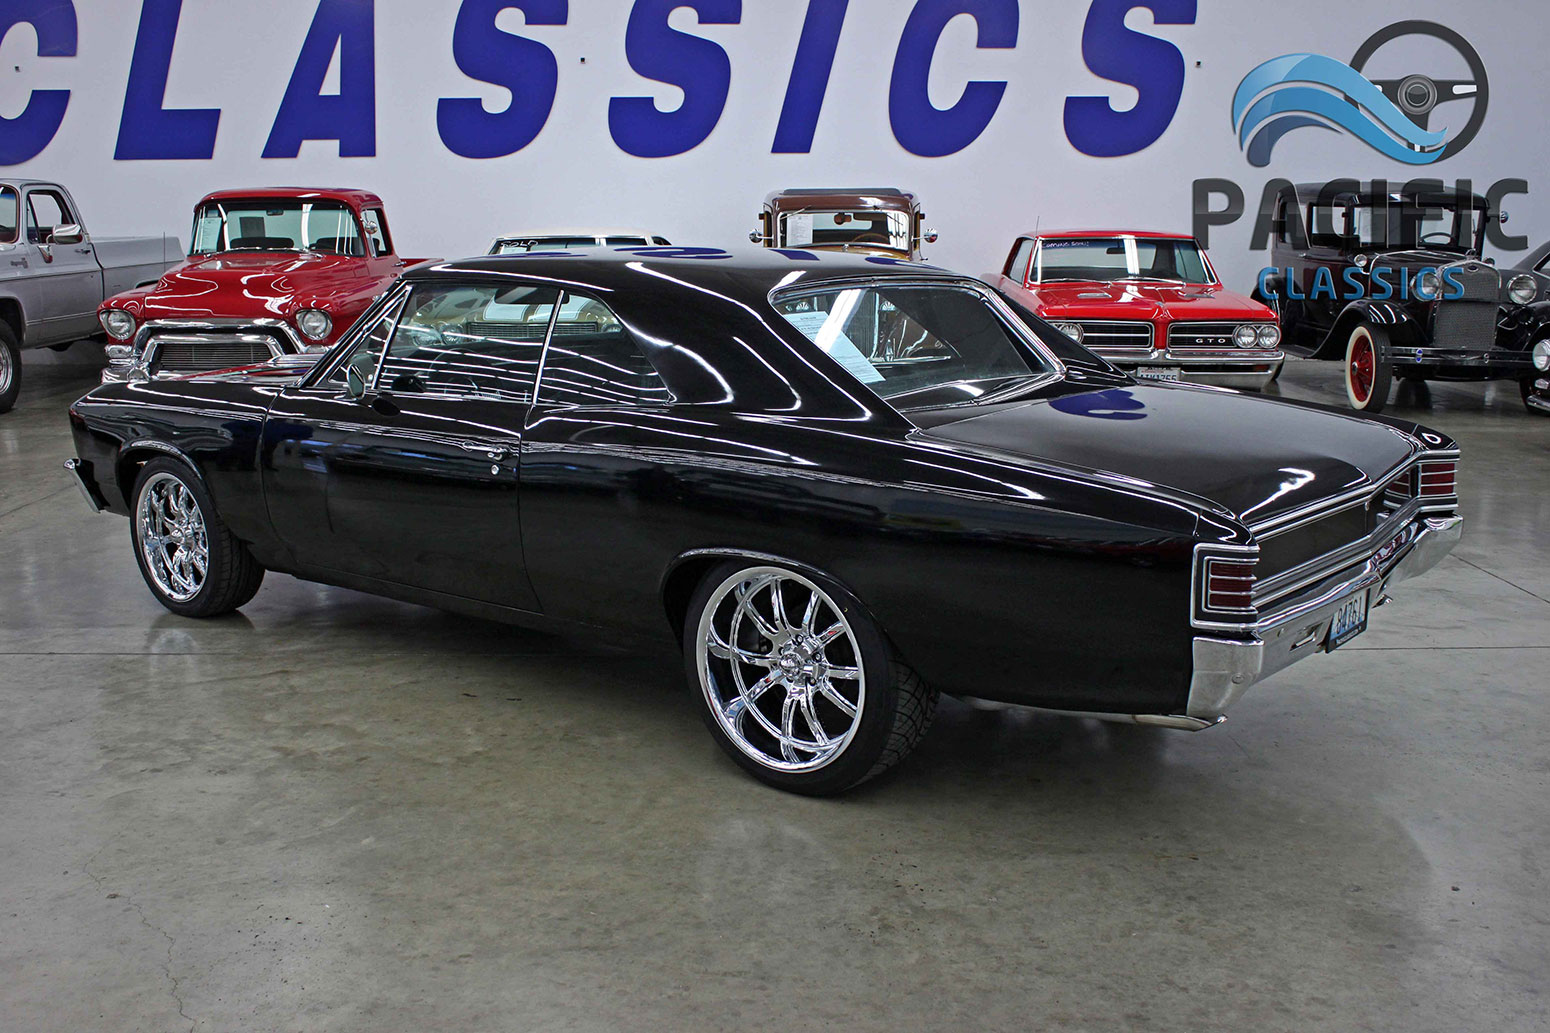 67 black chevelle (6)